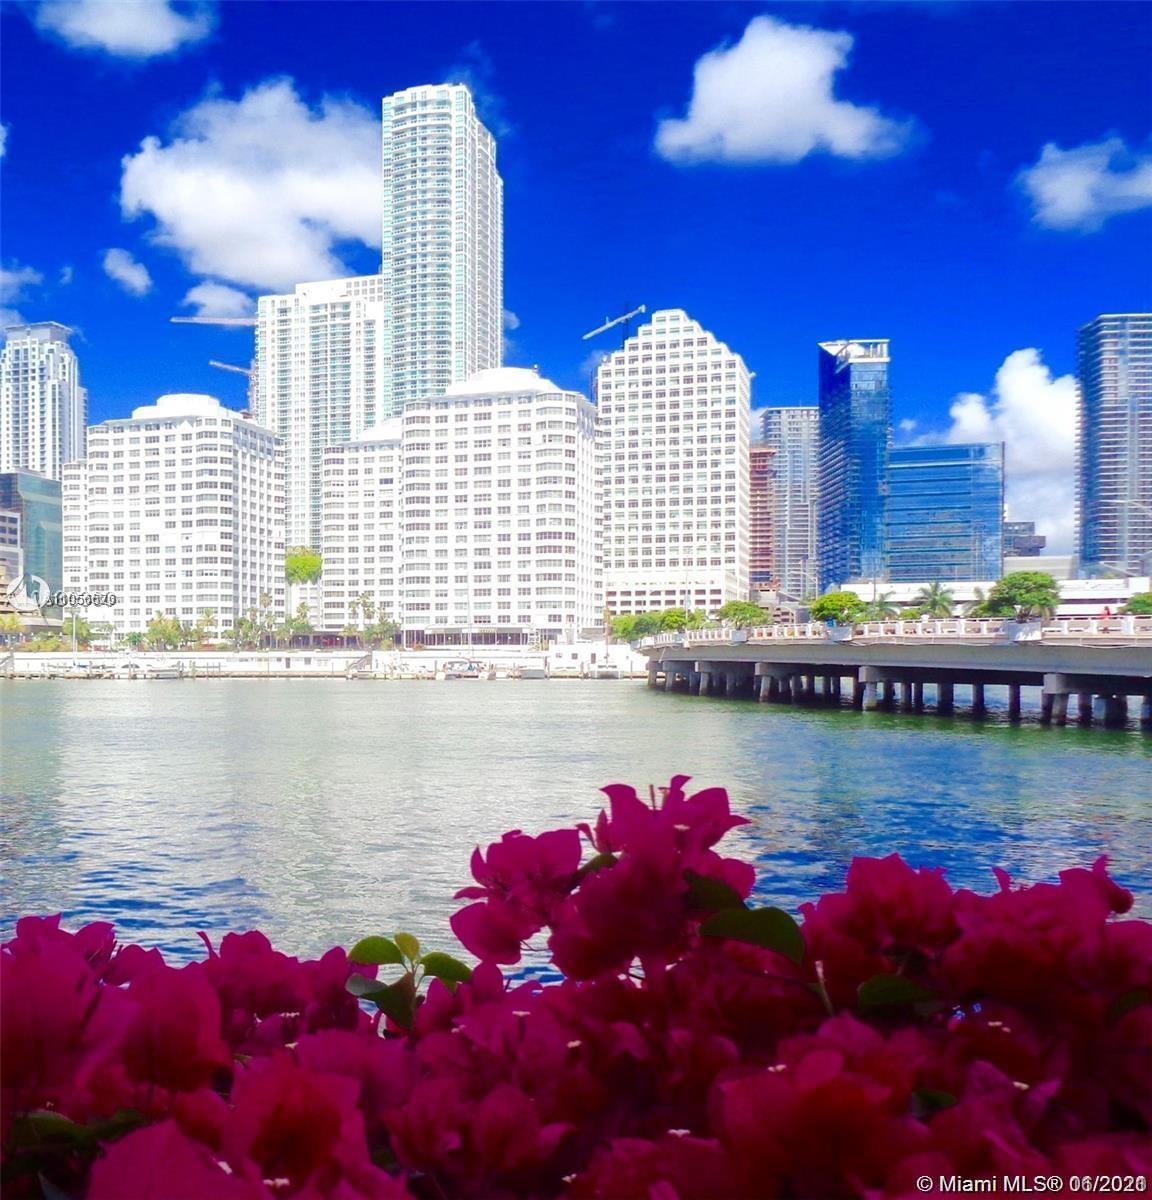 Courts Brickell Key #665 - 801 Brickell Bay Dr #665, Miami, FL 33131